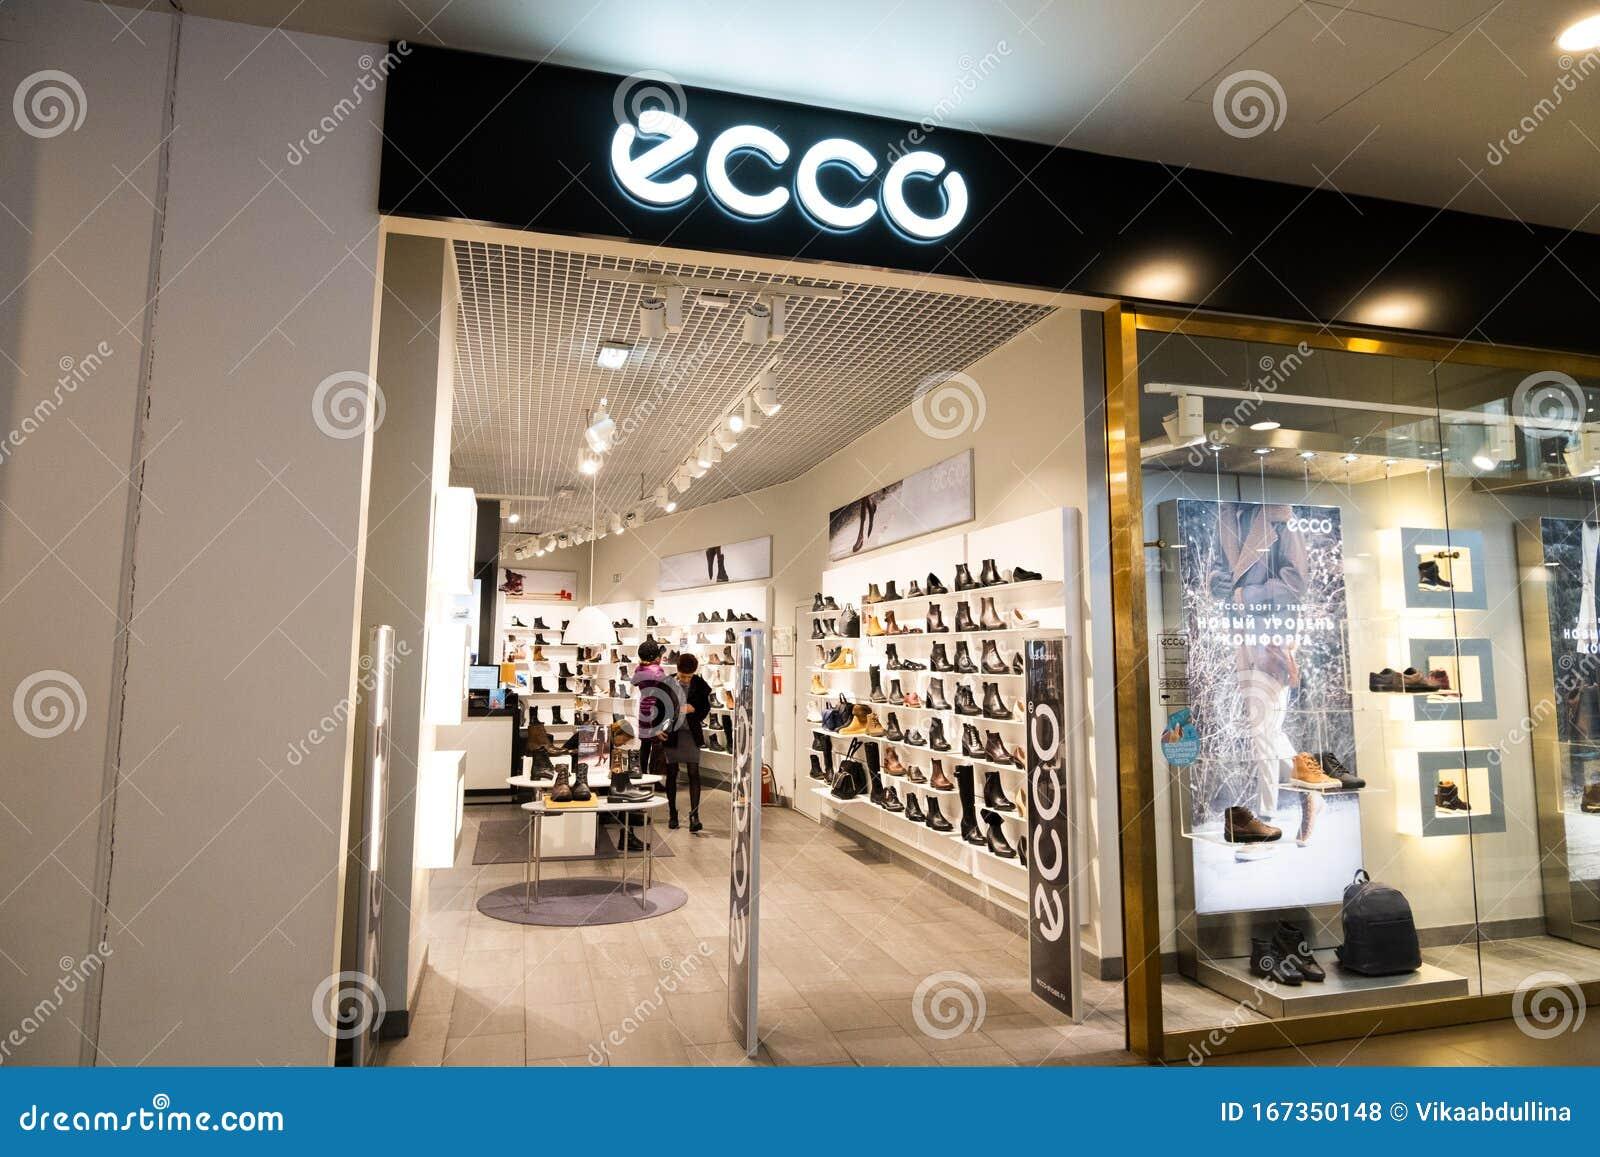 Ecco Store In Galeria Shopping Mall In